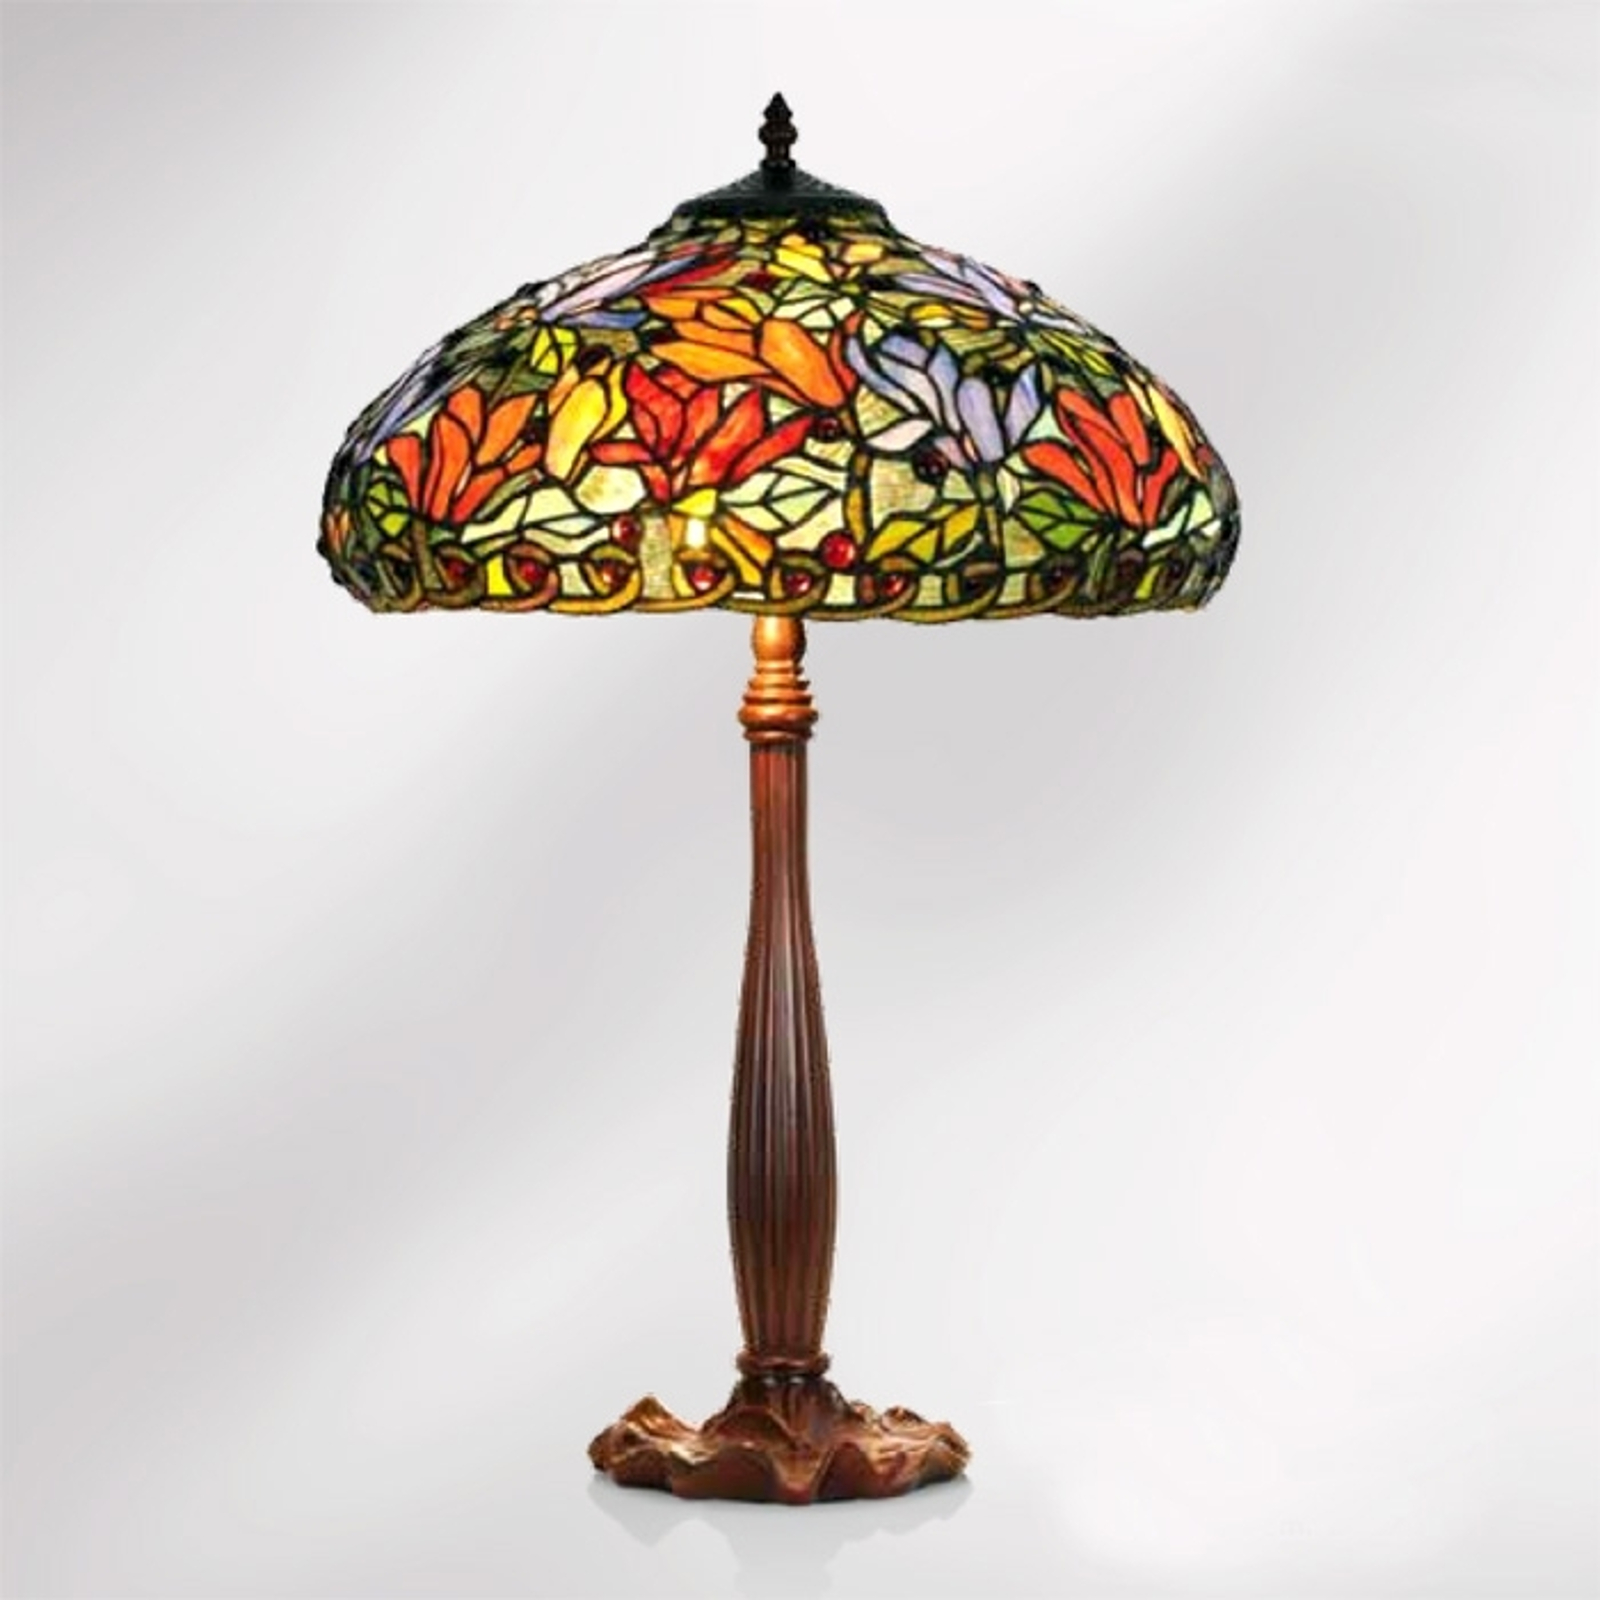 Elaine - bordlampe i blomstret Tiffany stil, 64 cm